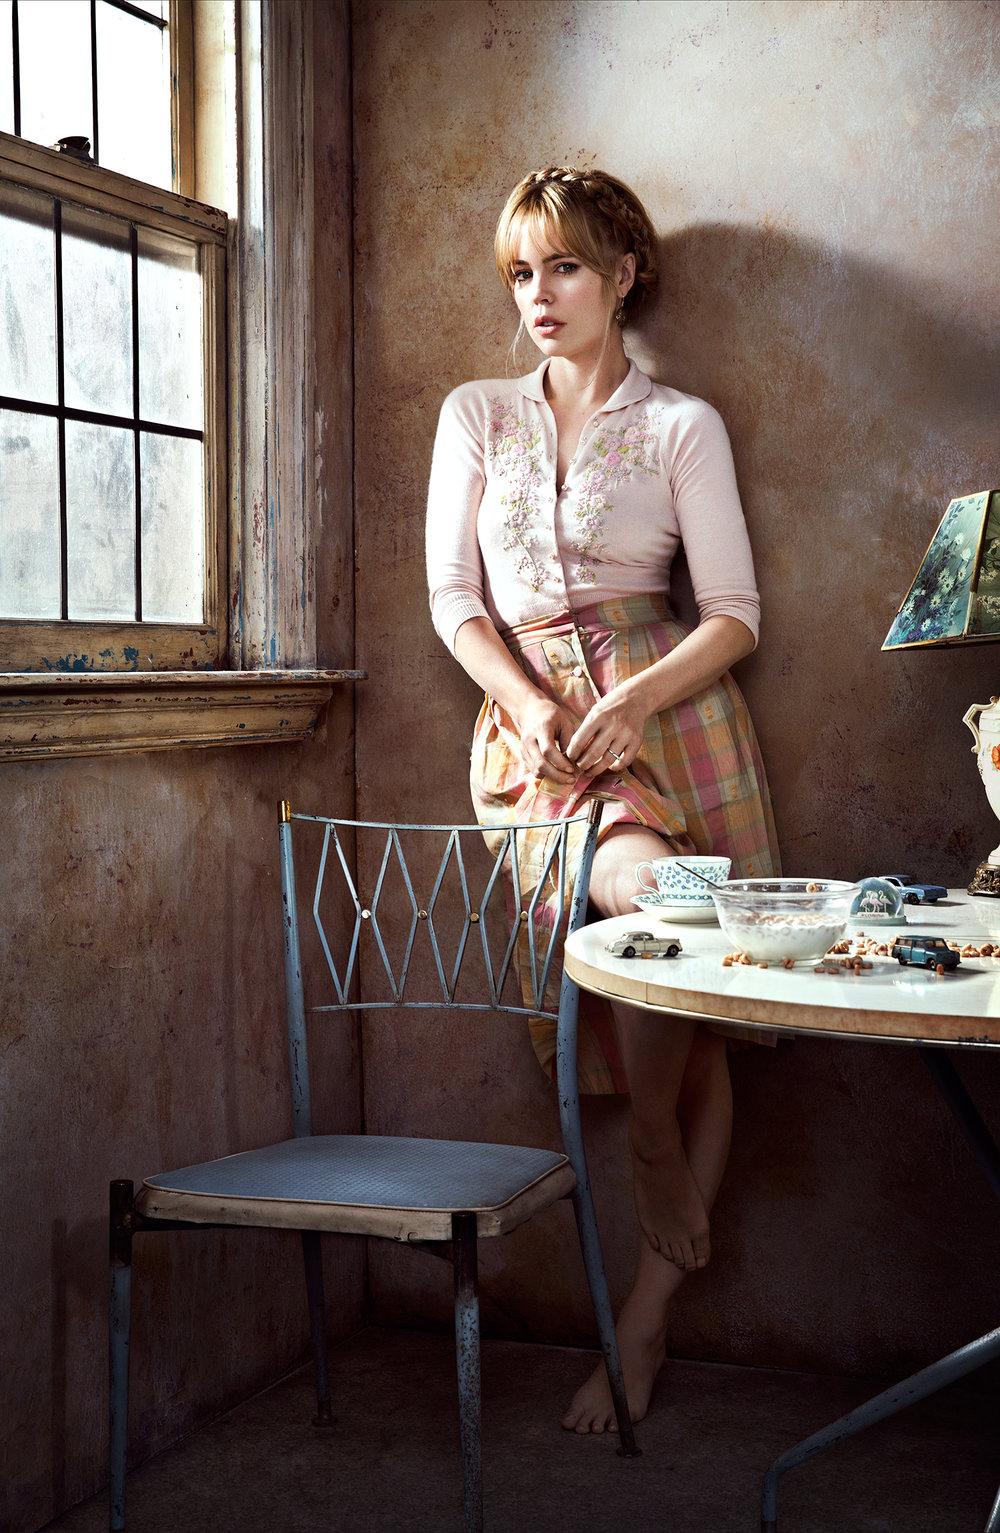 NBC - Melissa George in The Slap - Brooklyn, NY